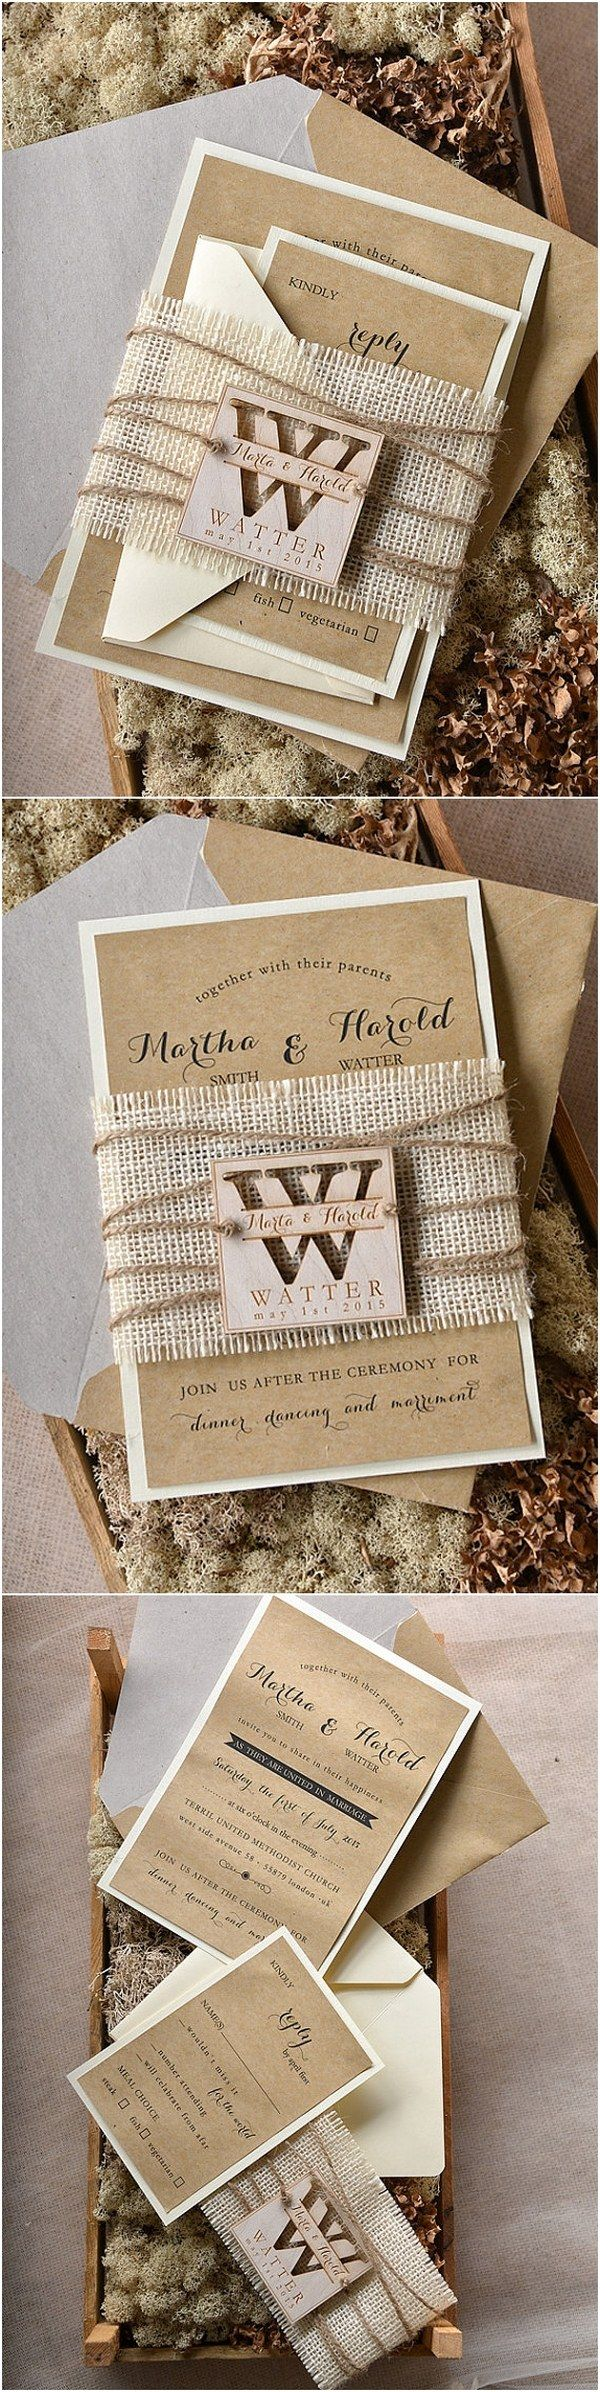 WEDDING INVITATIONS rustic | Burlap weddings, Weddingideas and Burlap